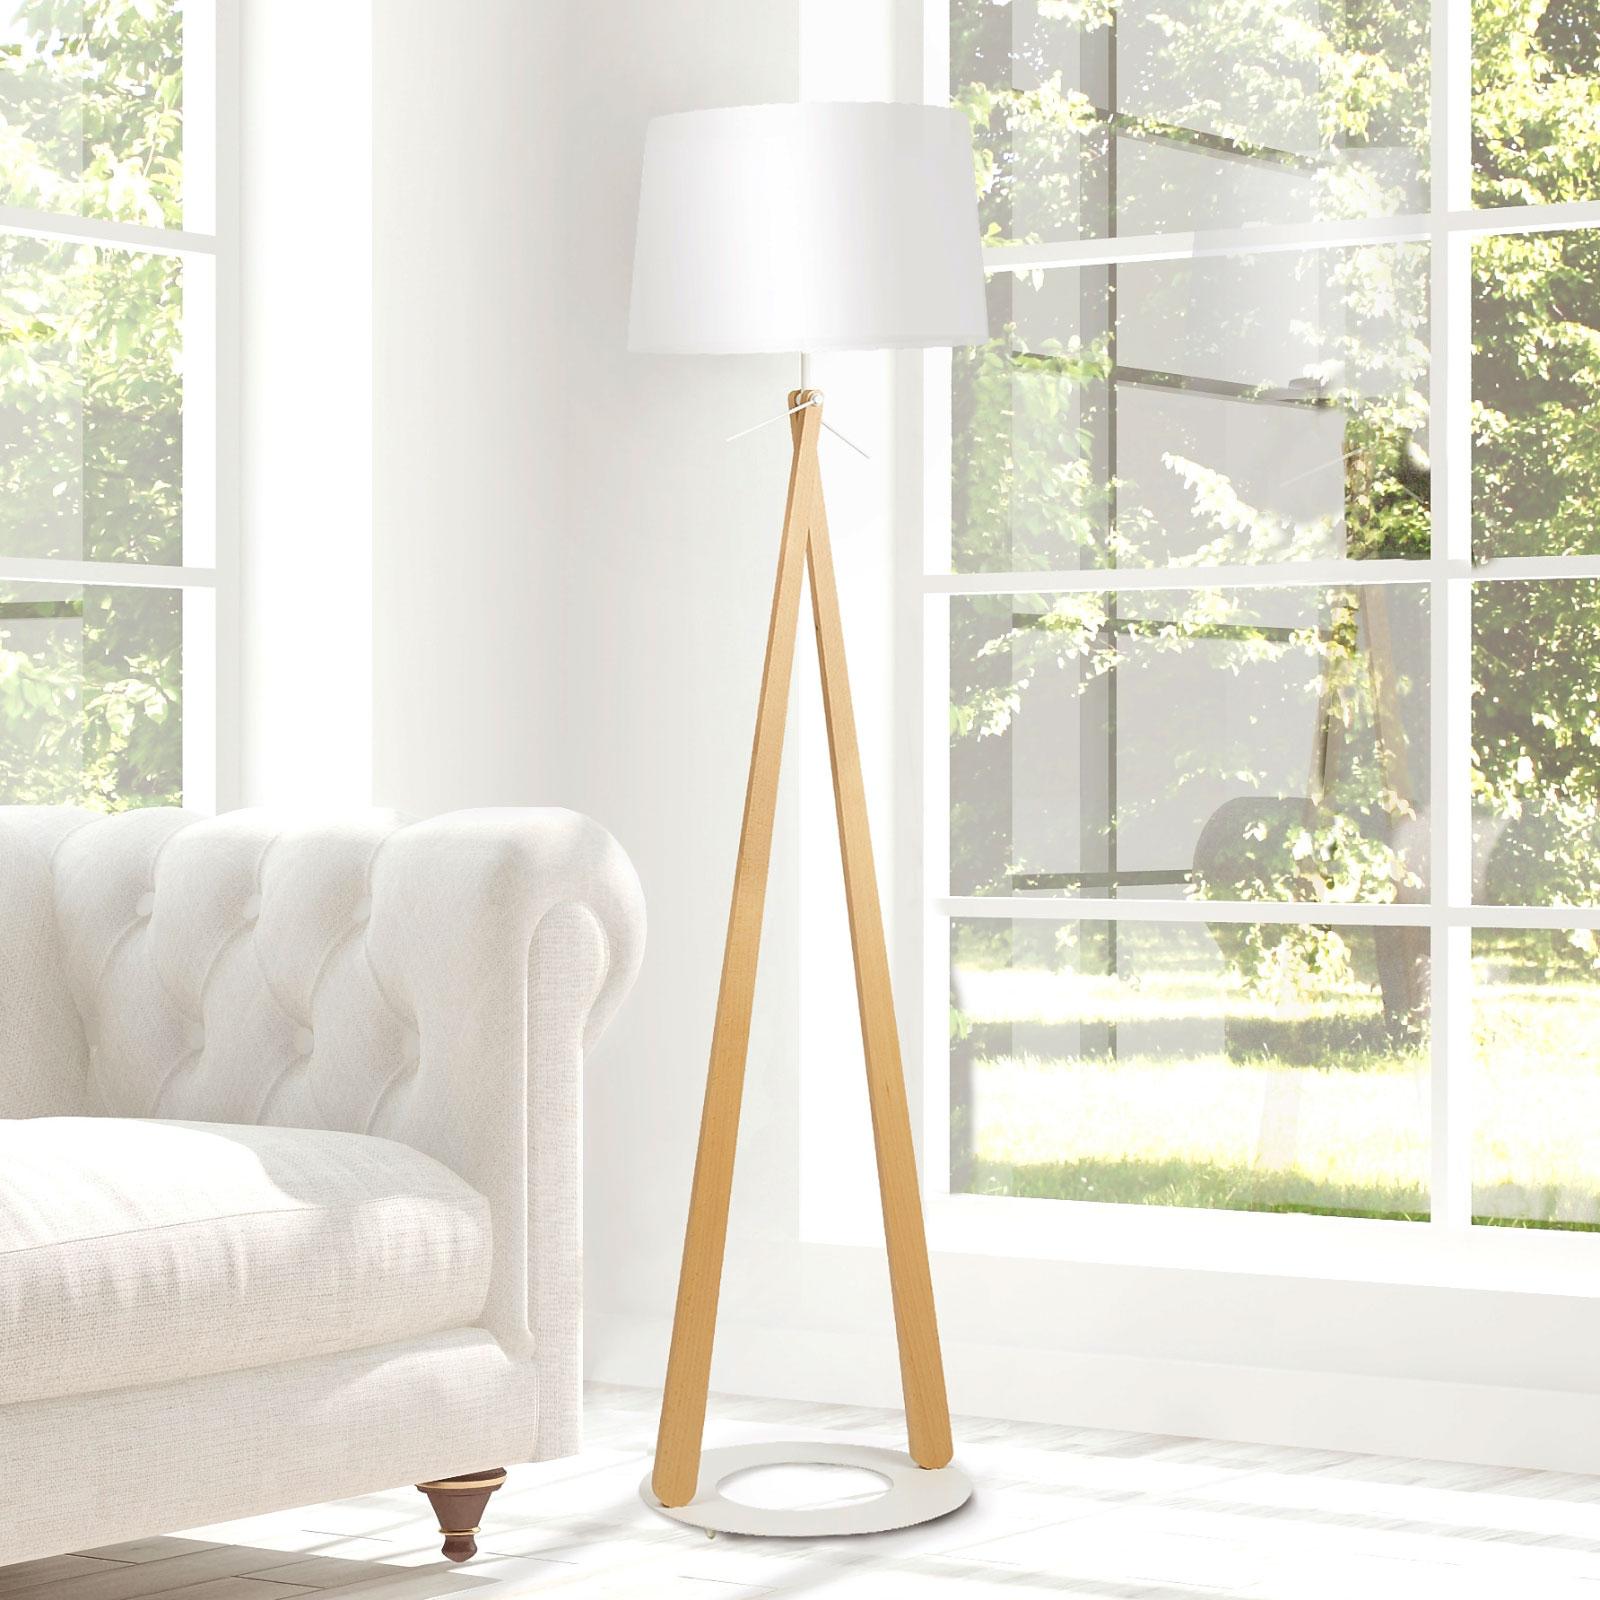 Zazou LS gulvlampe, tekstilskjerm, hvit sokkel